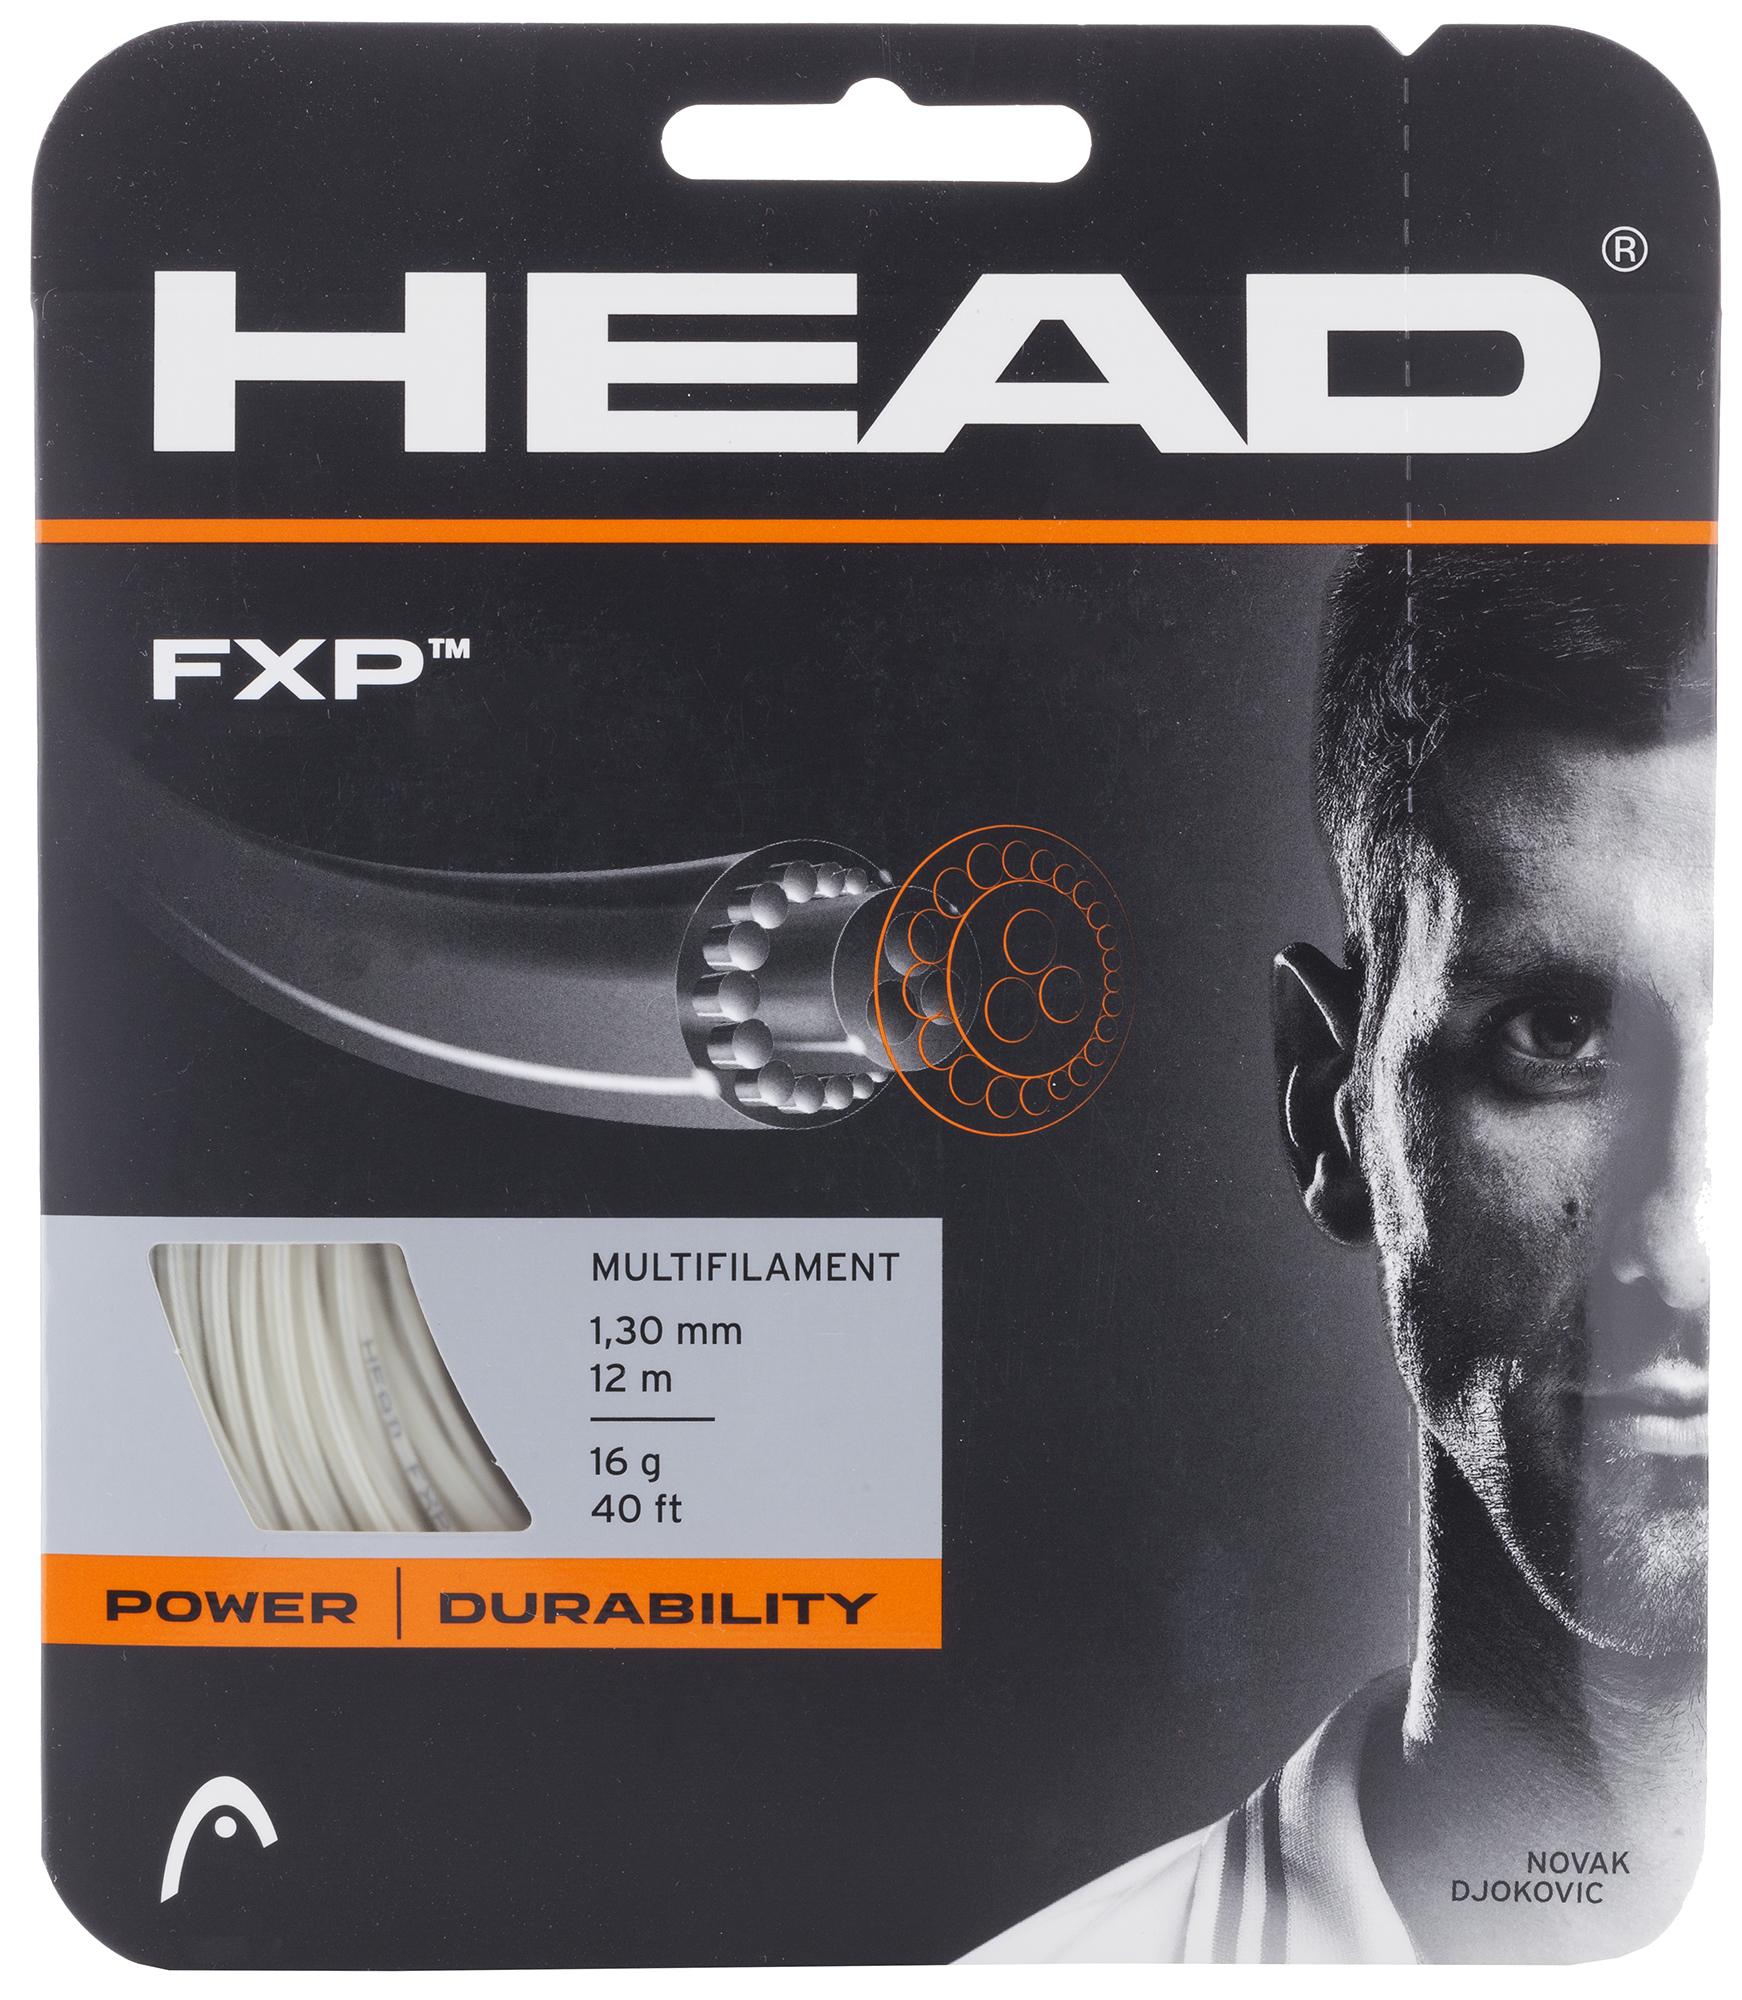 Head Струна Head FXP струна charmelle струна